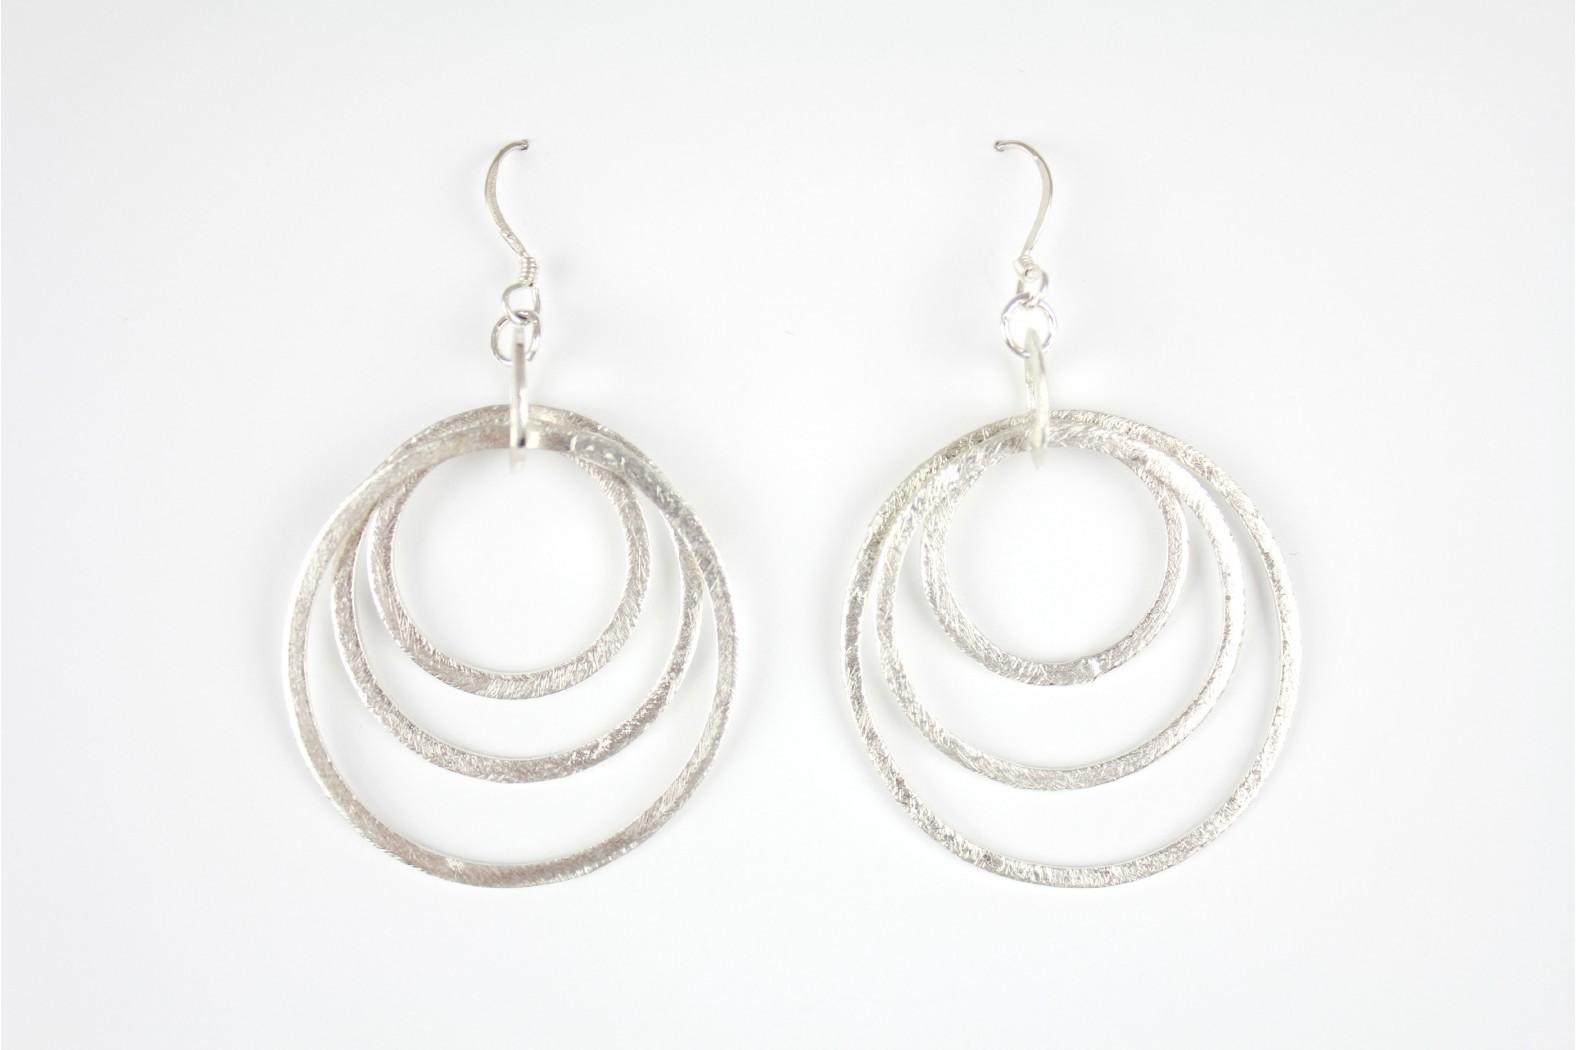 DE017. Large Triple circular pattern drop earrings Hand Made Individual design. £35.00 pair.